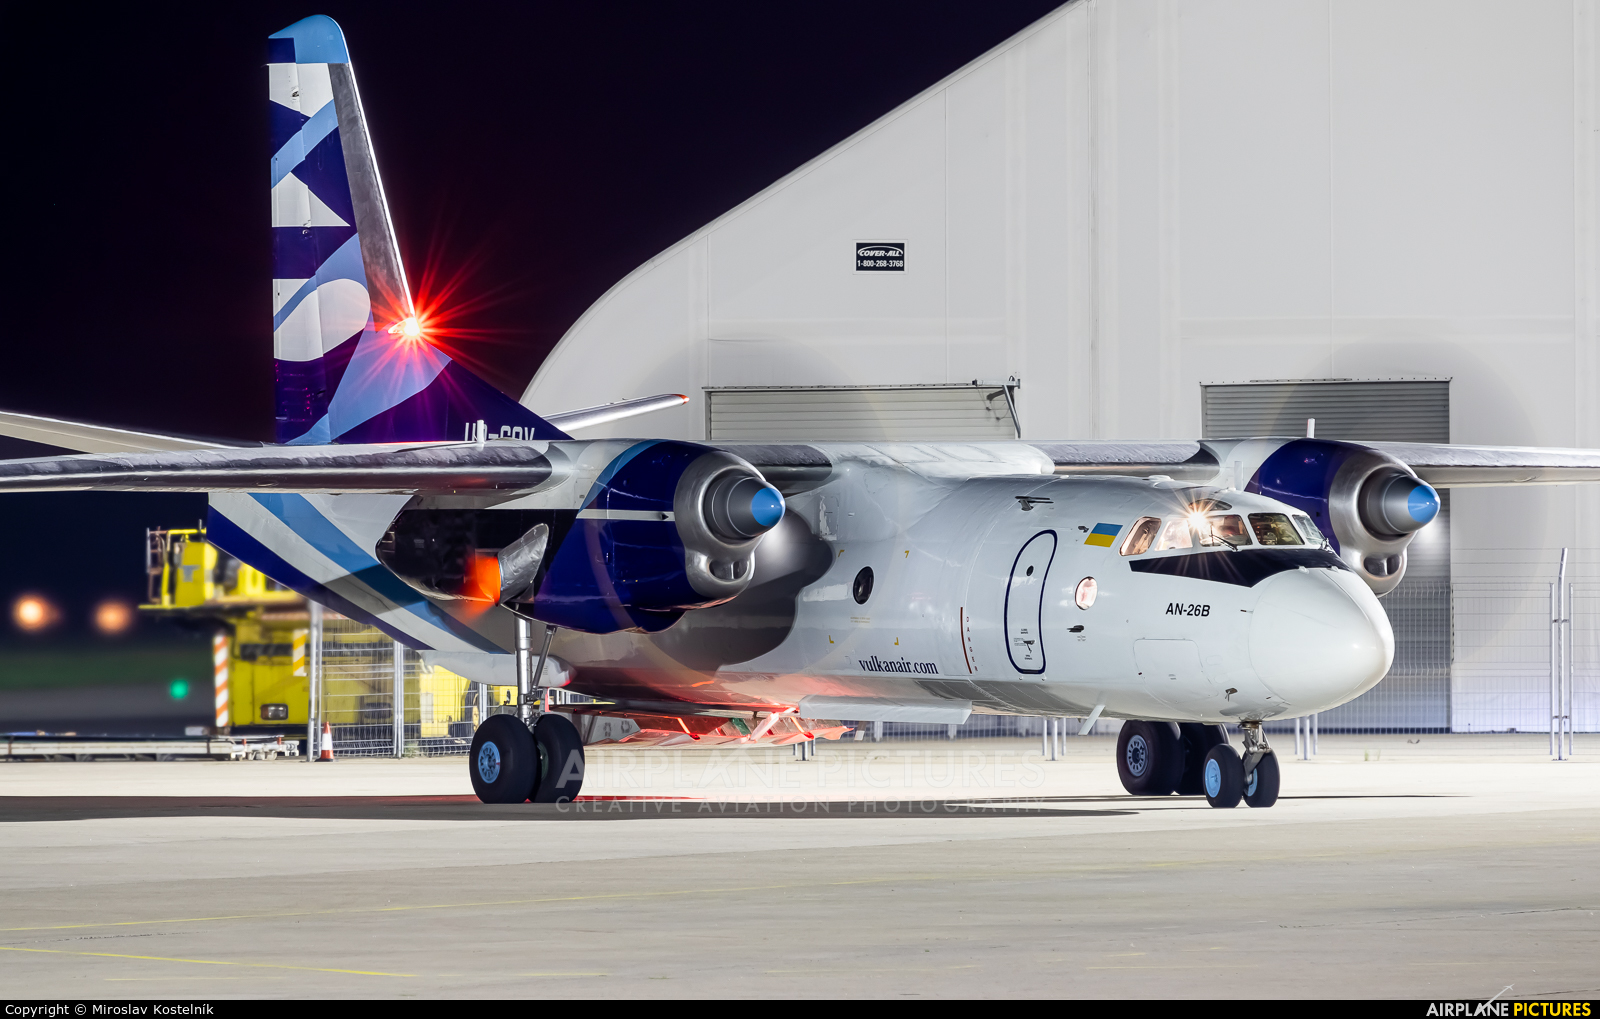 Vulkan Air UR-CQV aircraft at Ostrava Mošnov